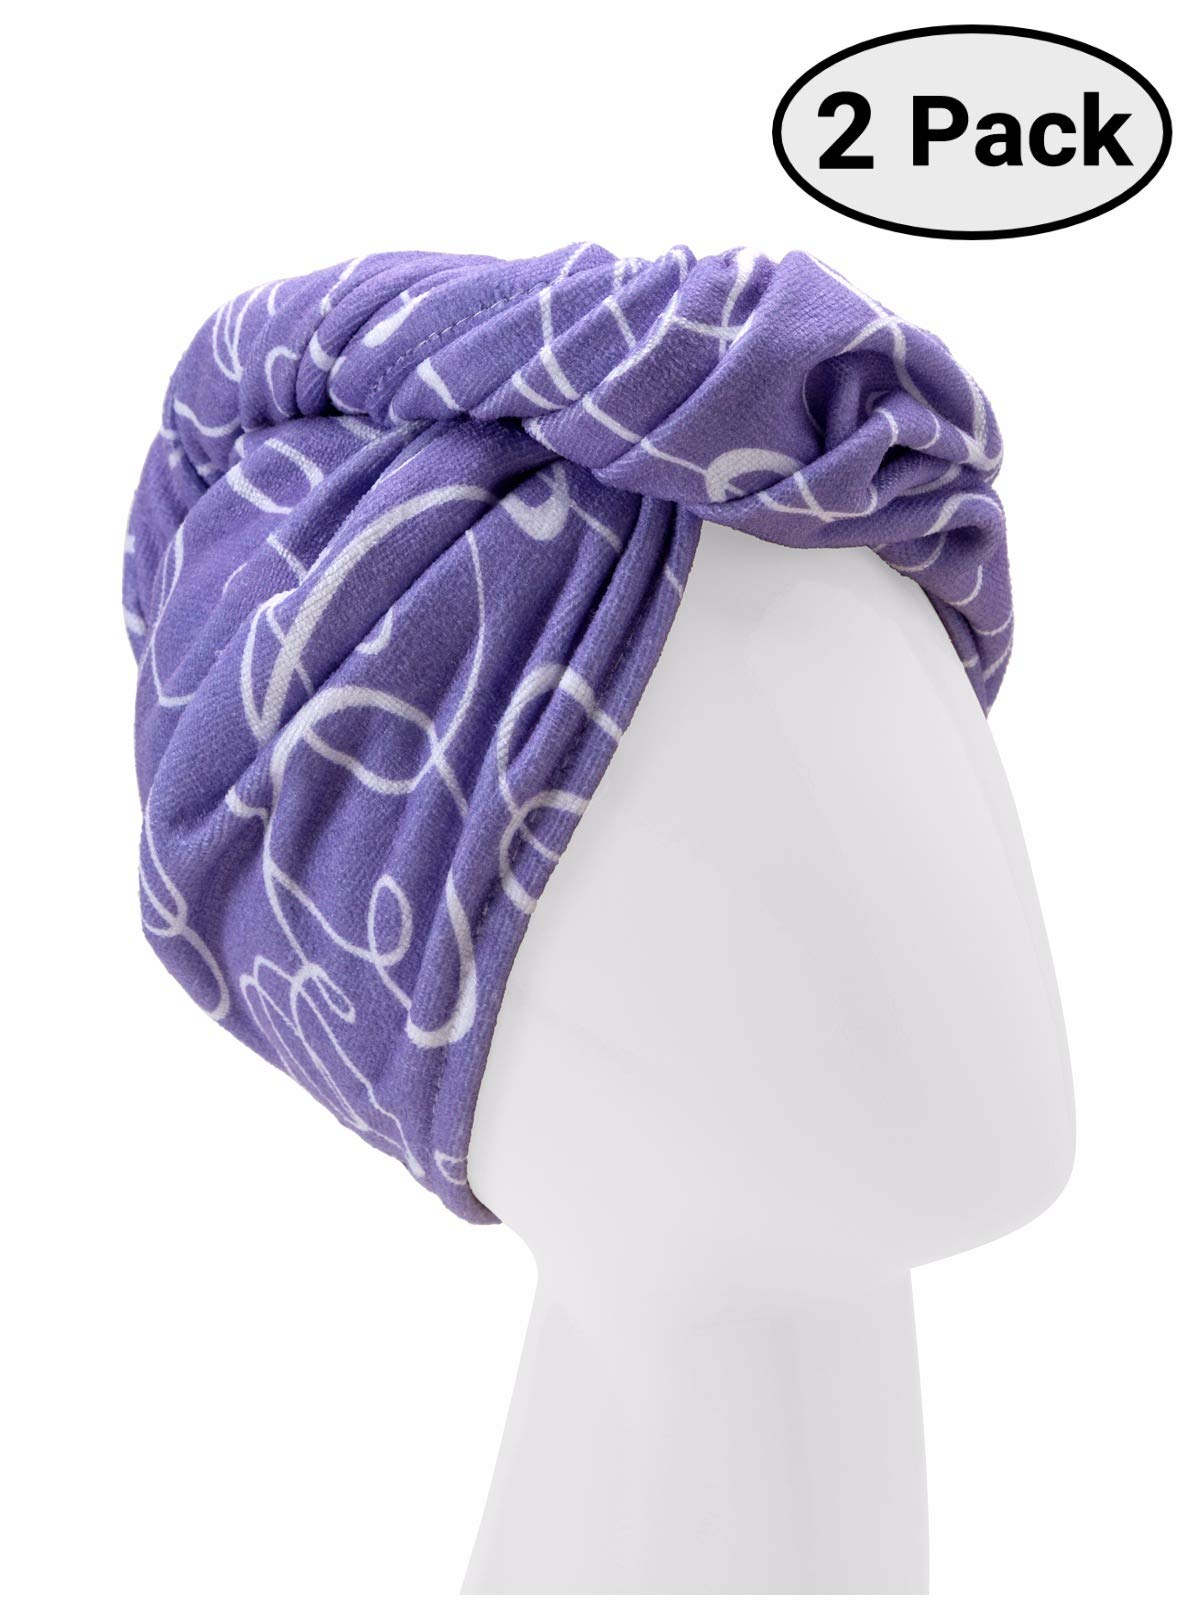 Turbie Twist Microfiber Hair Towel Wrap [2 Pack] - The Original Microfiber Hair Wrap As Seen On TV! Signature Prints [Purple] Hair Turban Towel Wraps - Plopping Towel for Long and Curly Hair Women by Turbie Twist